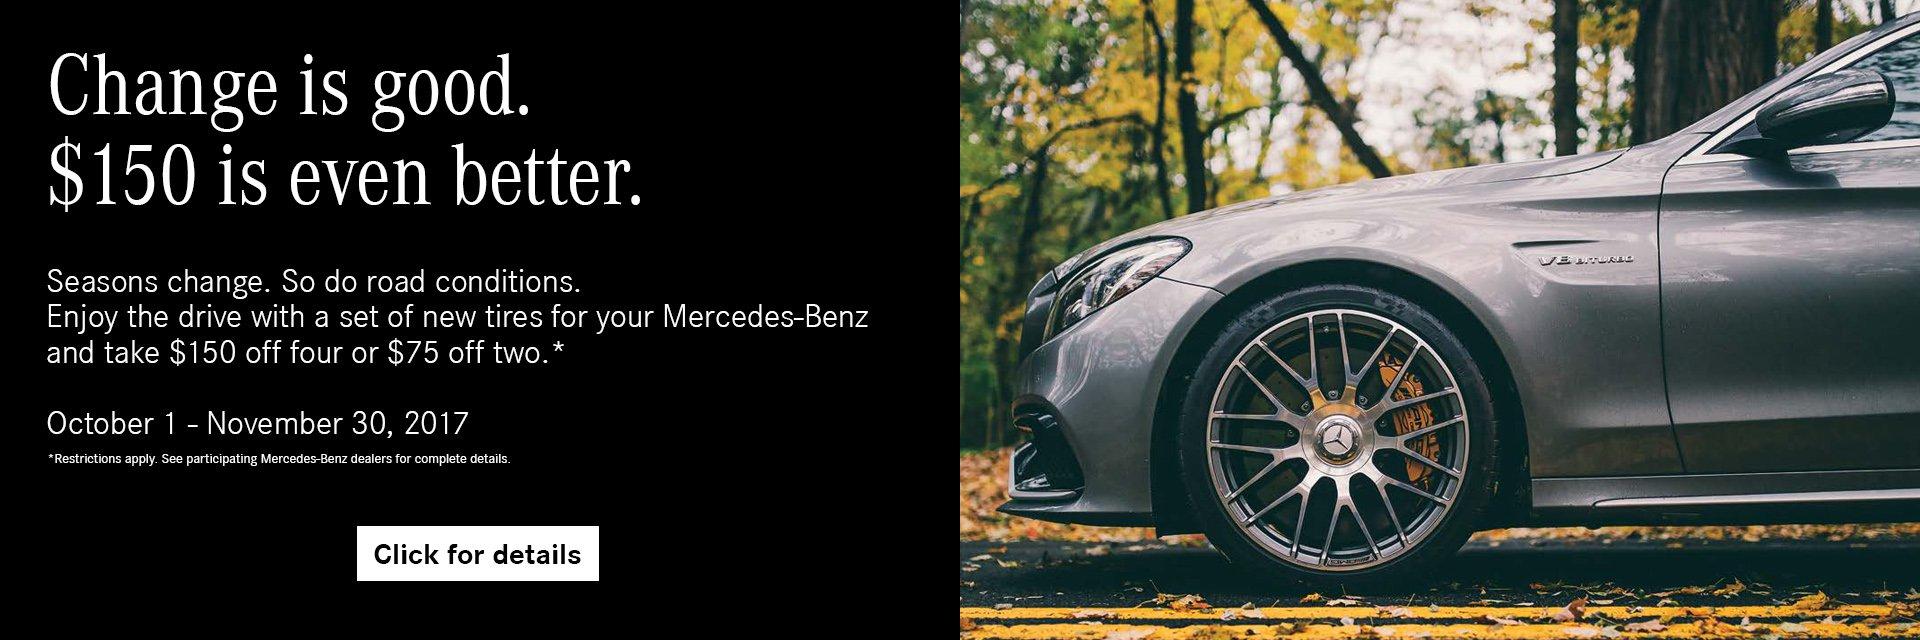 Mercedes Benz Service Parts Specials Cape Cod Ma Prime Service Center Of Hyannis